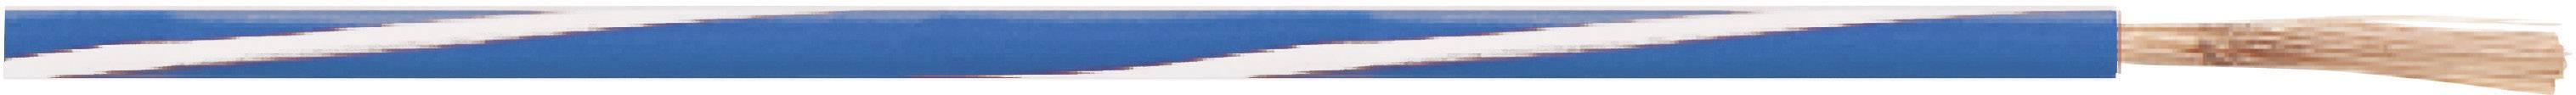 Opletenie / lanko LappKabel 4512221S X05V-K, 1 x 0.50 mm², vonkajší Ø 2.10 mm, metrový tovar, čierna, biela